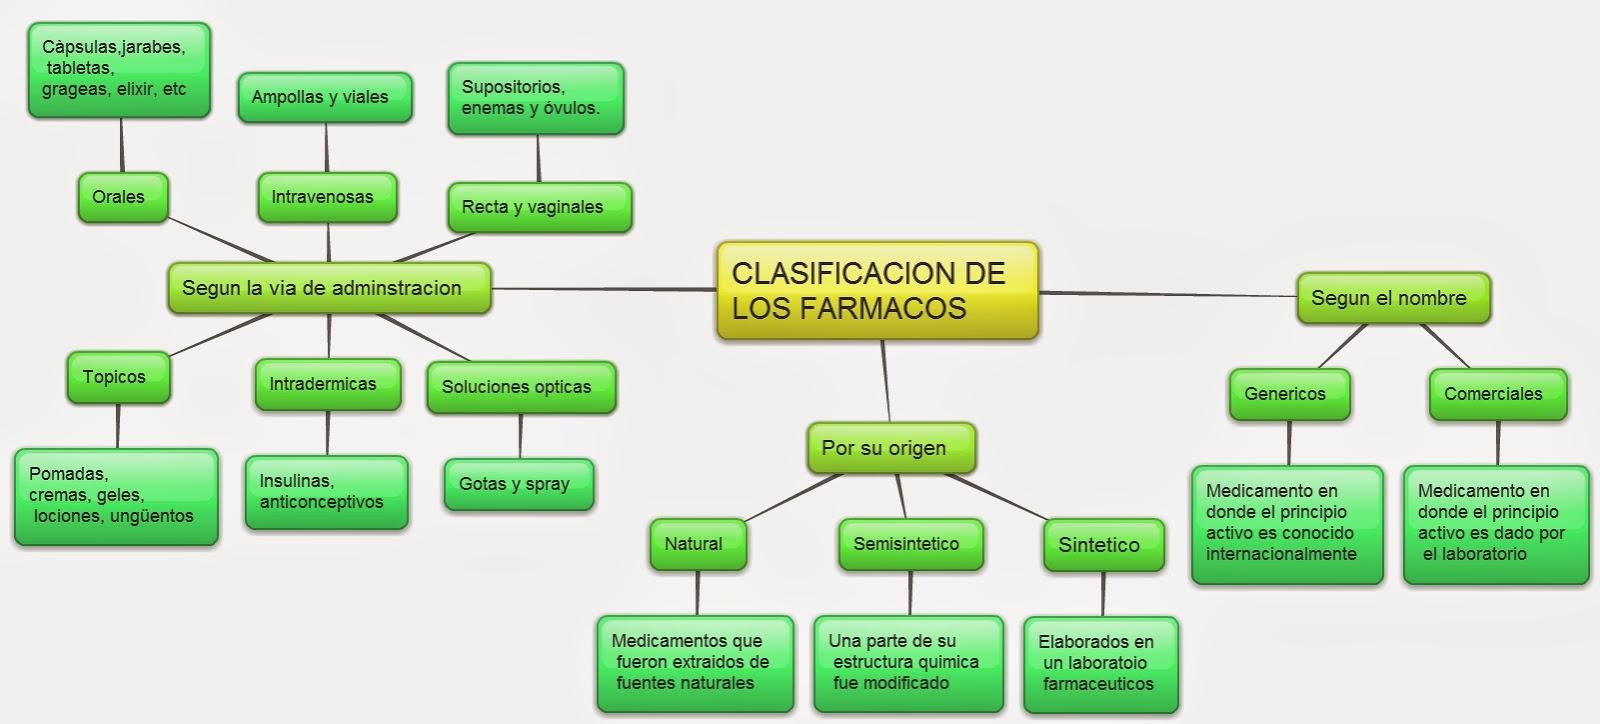 clasificacion de los esteroides farmacologia